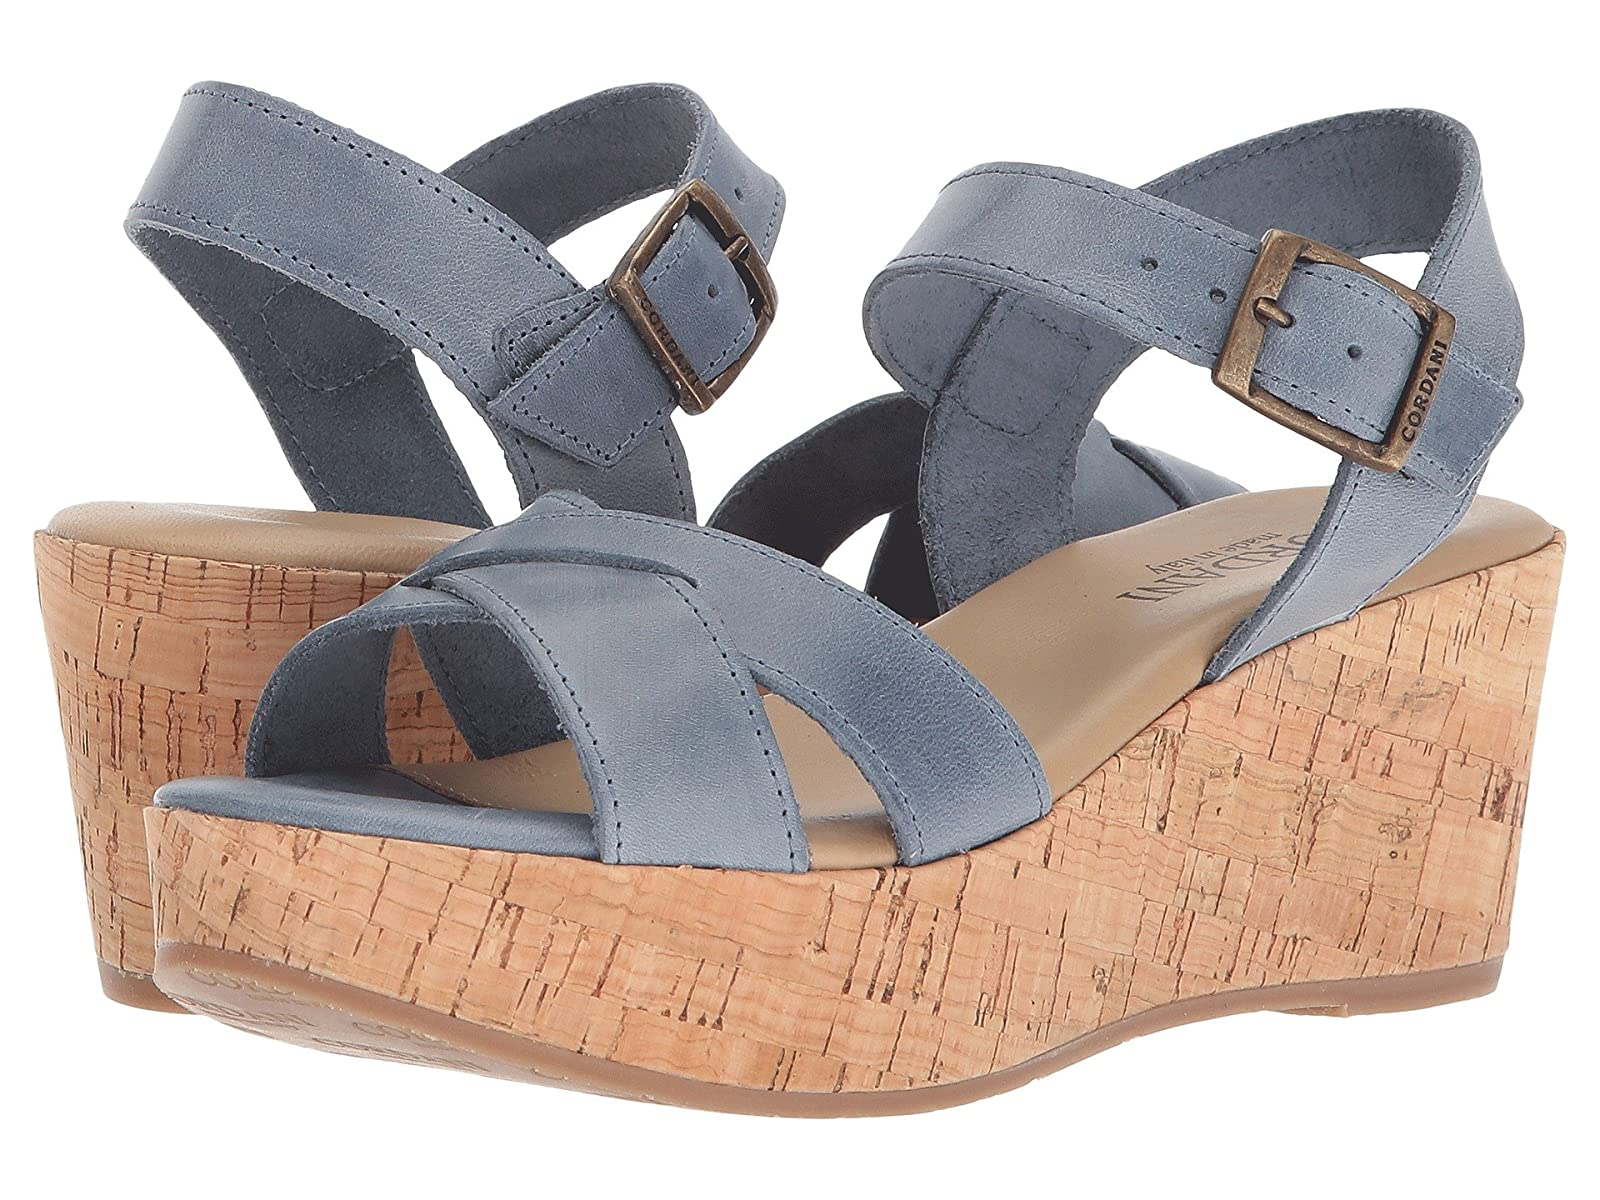 Cordani CandyAtmospheric grades have affordable shoes